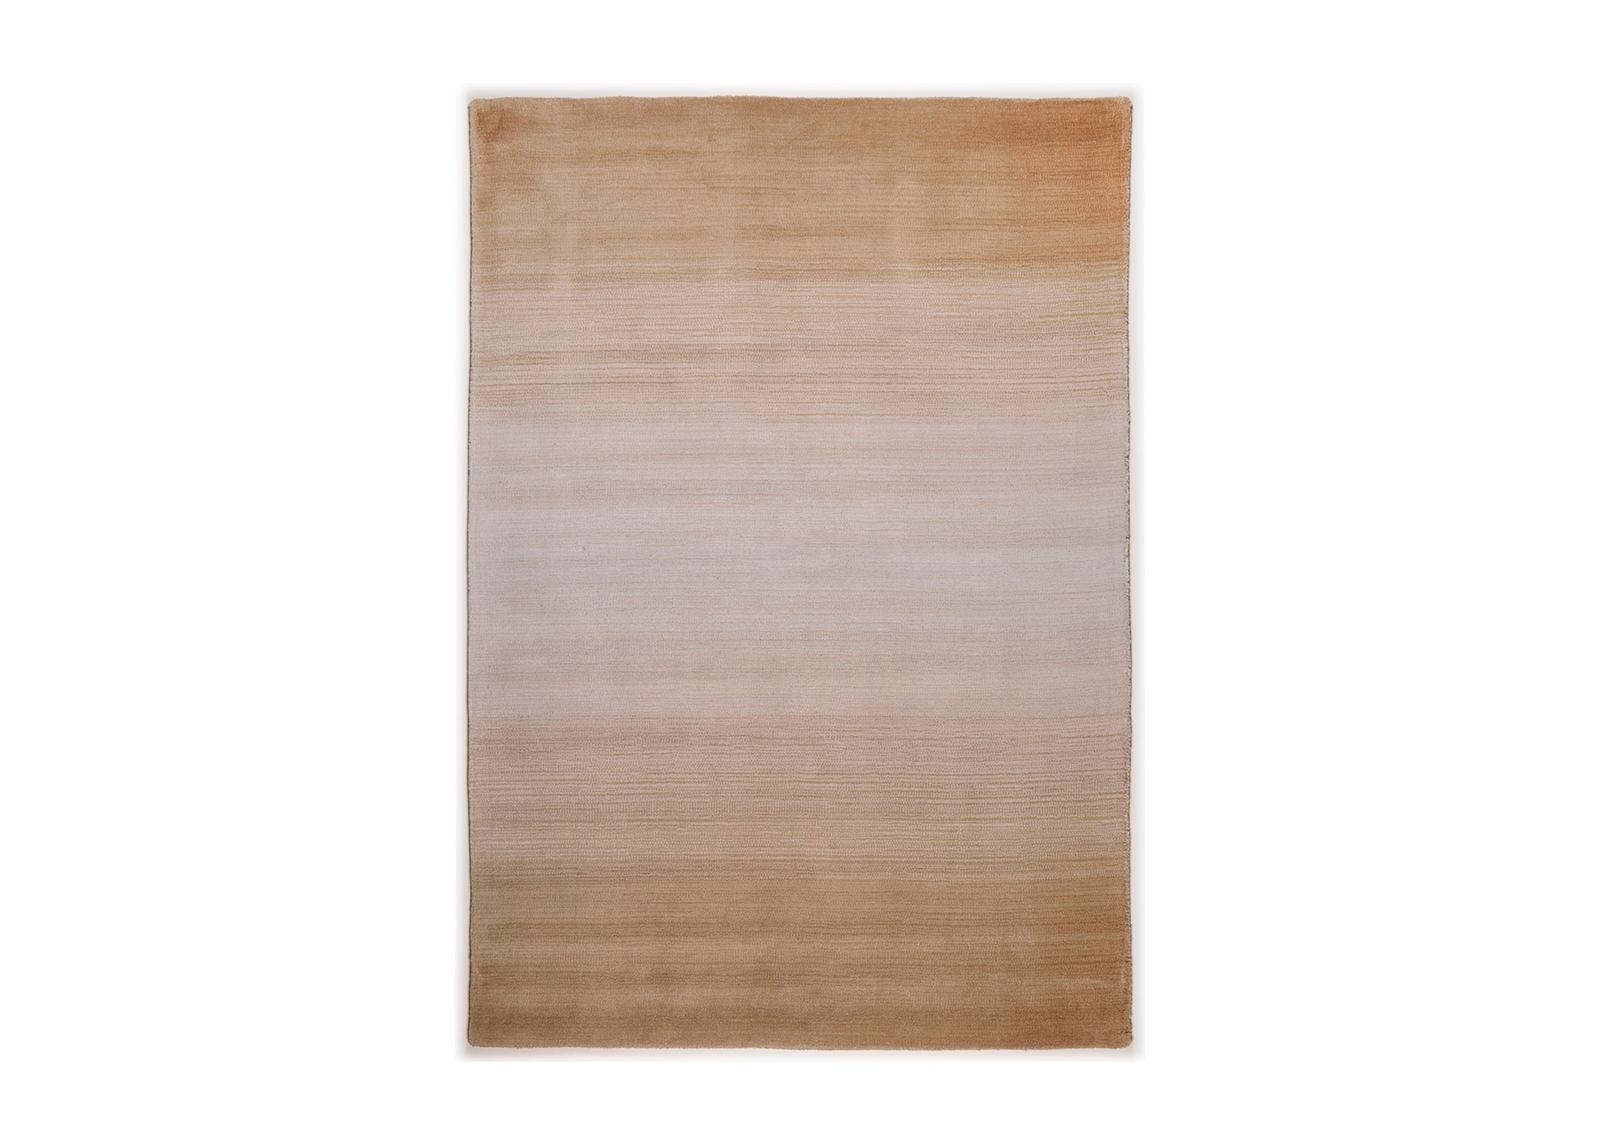 Villamatto Wool Comfort 140x200 cm, beige